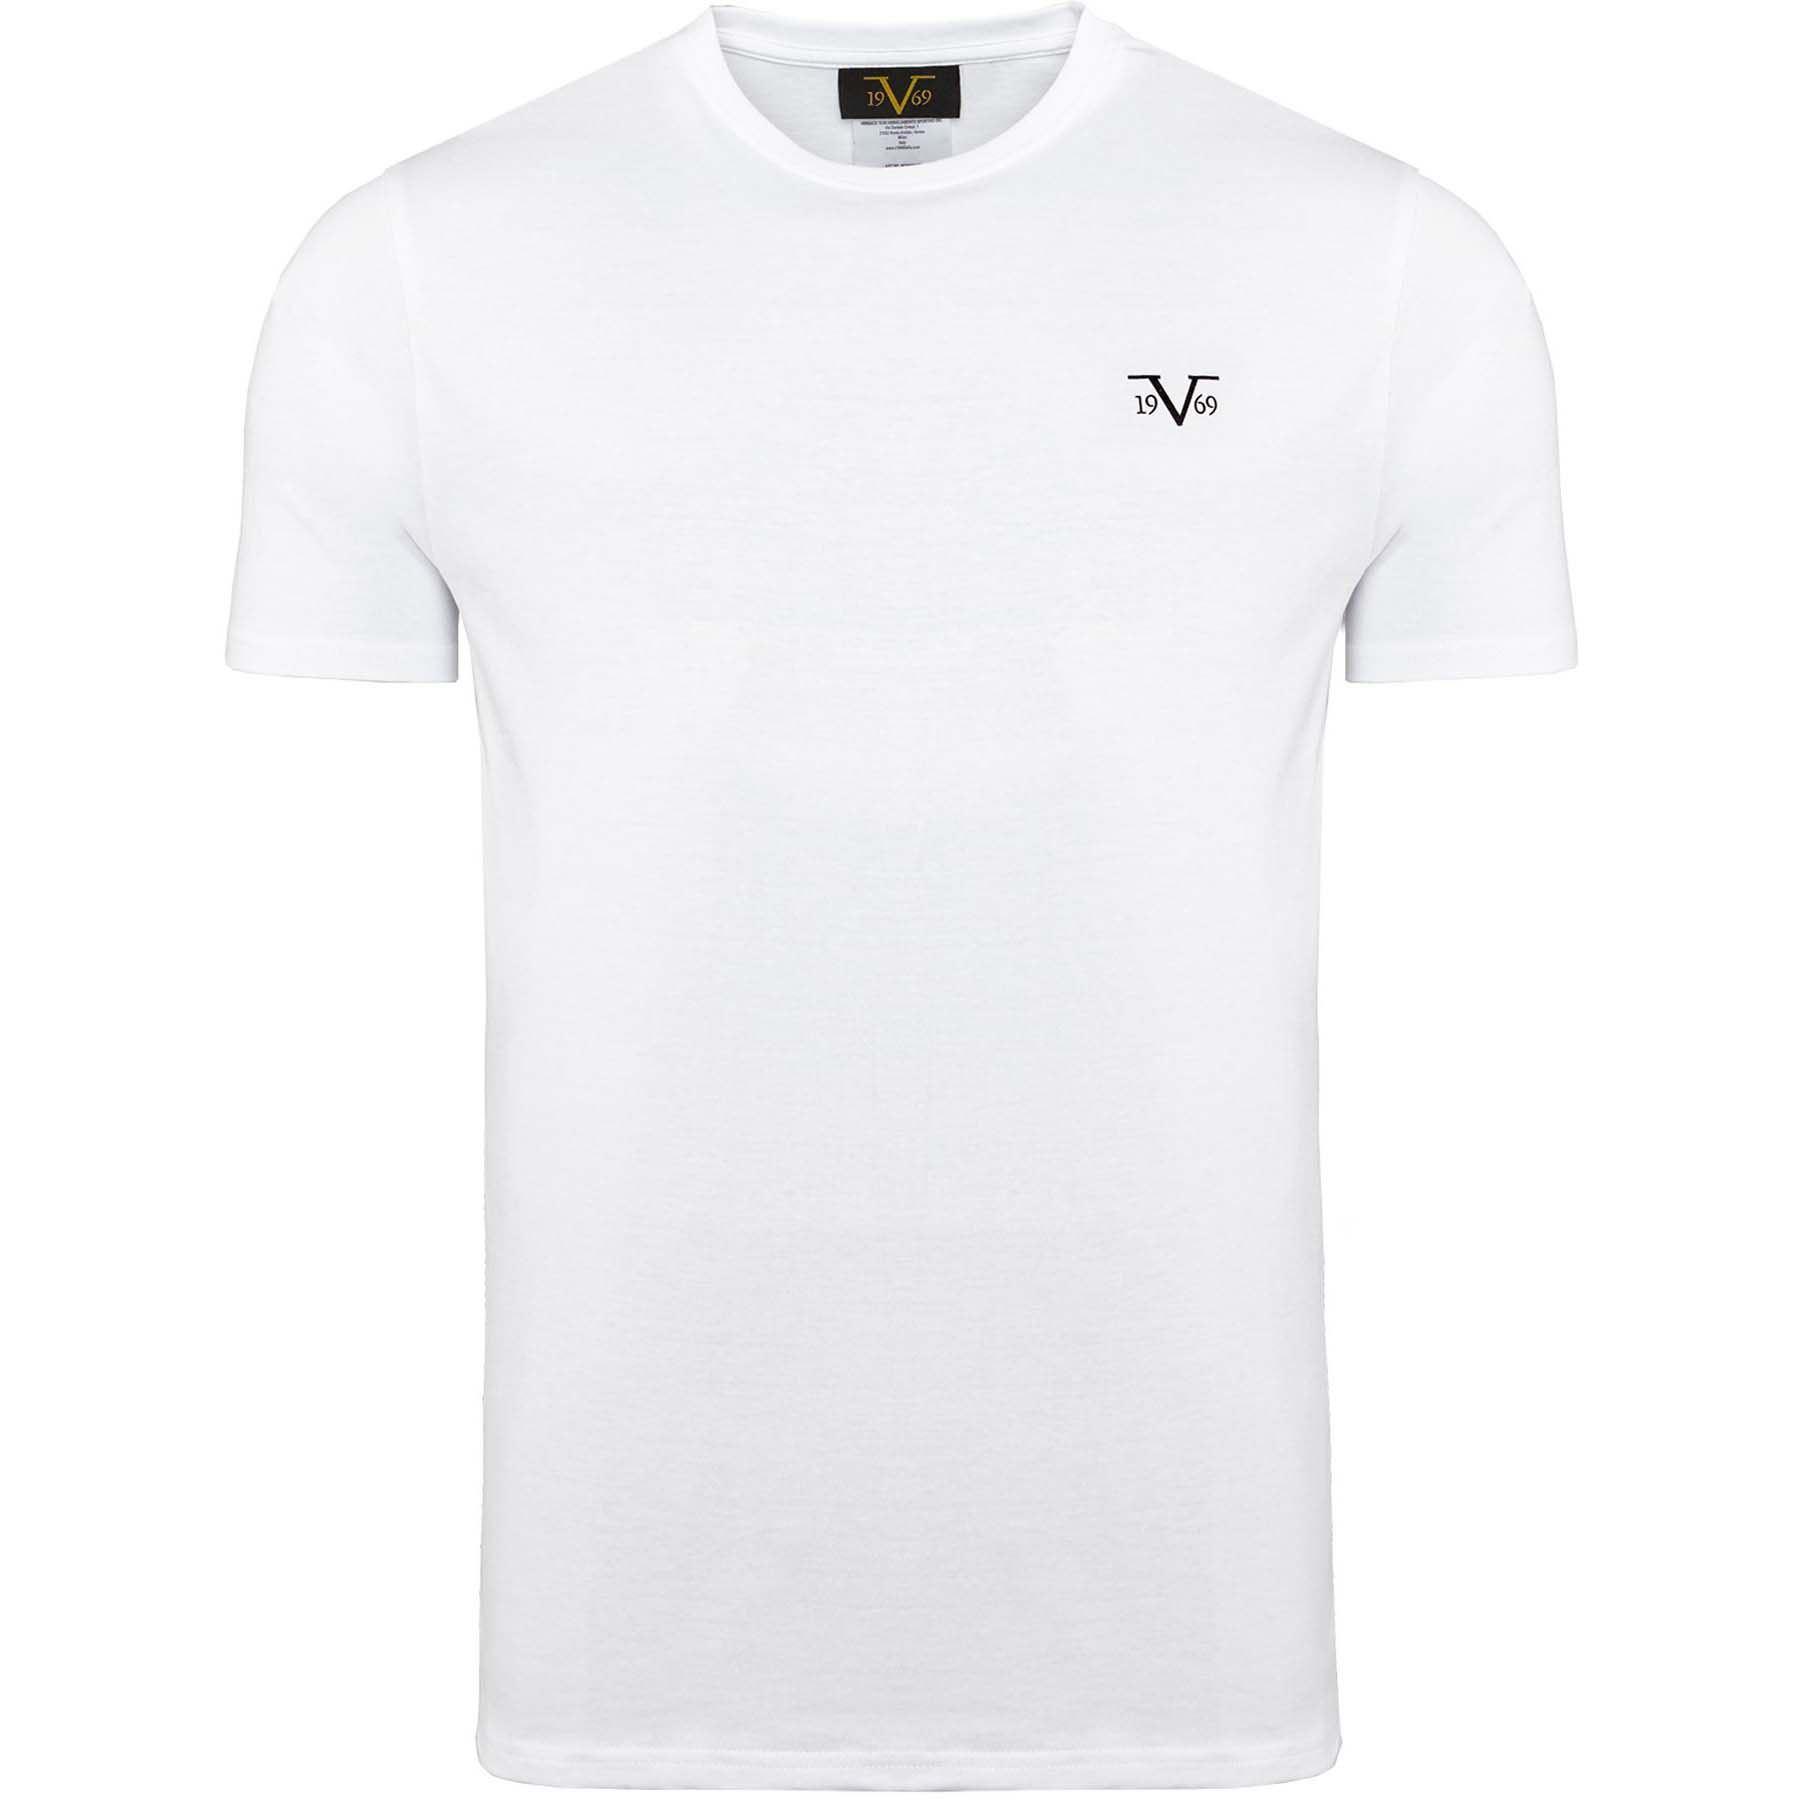 6f52fd38 19V69 T-Shirt Round-Neck 3-Pack men L white